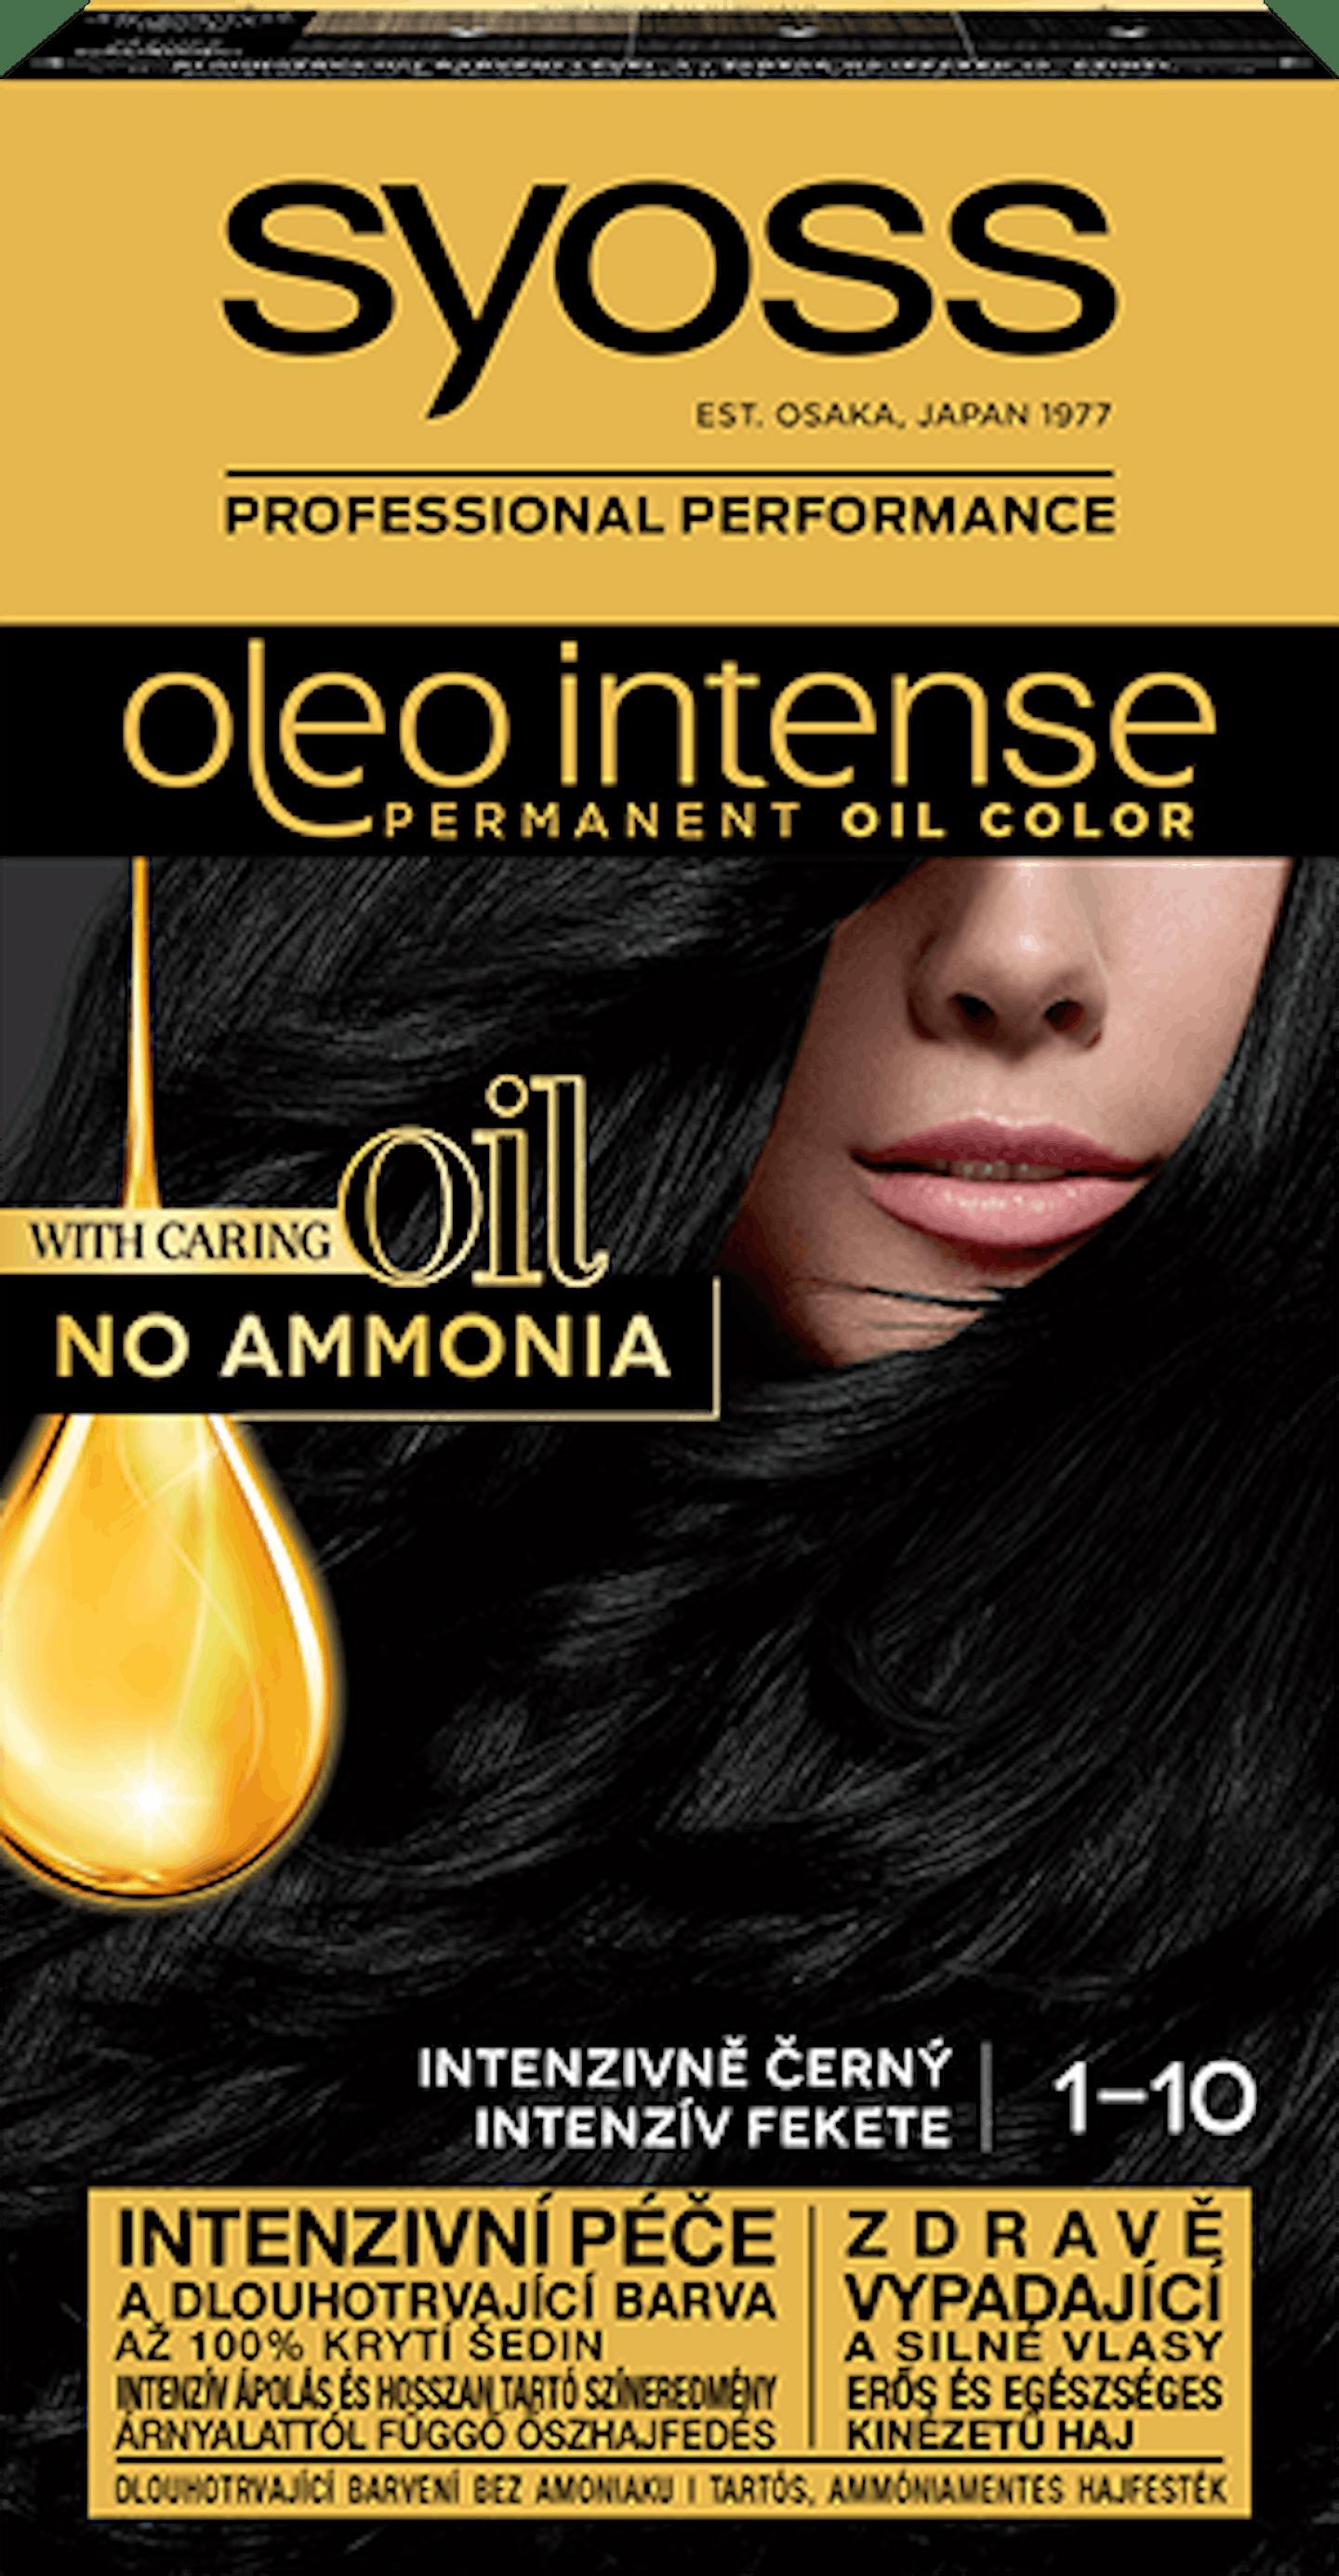 Oleo intense vopsea permanentă cu ulei - nuanta negru intens 1-10